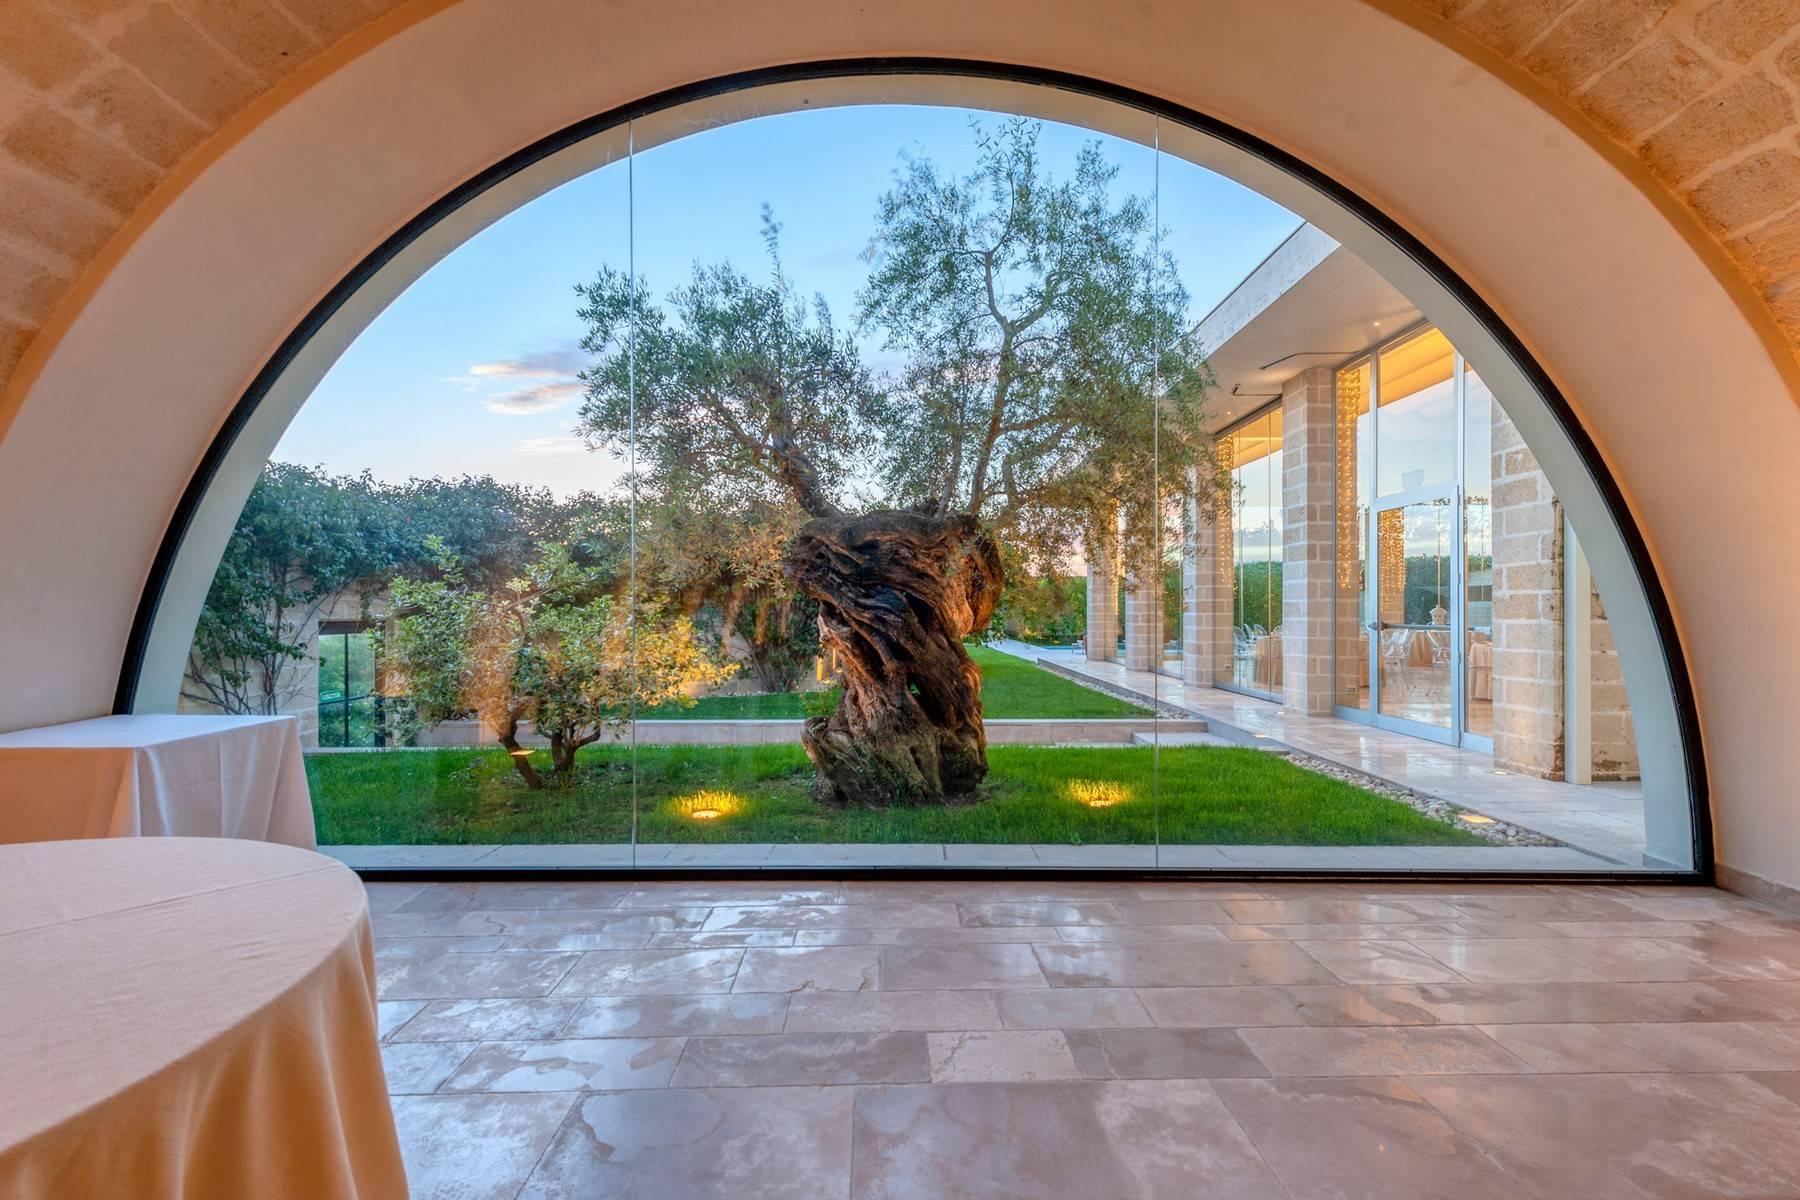 Splendida villa gentilizia del '600 circondata da agrumeti - 29